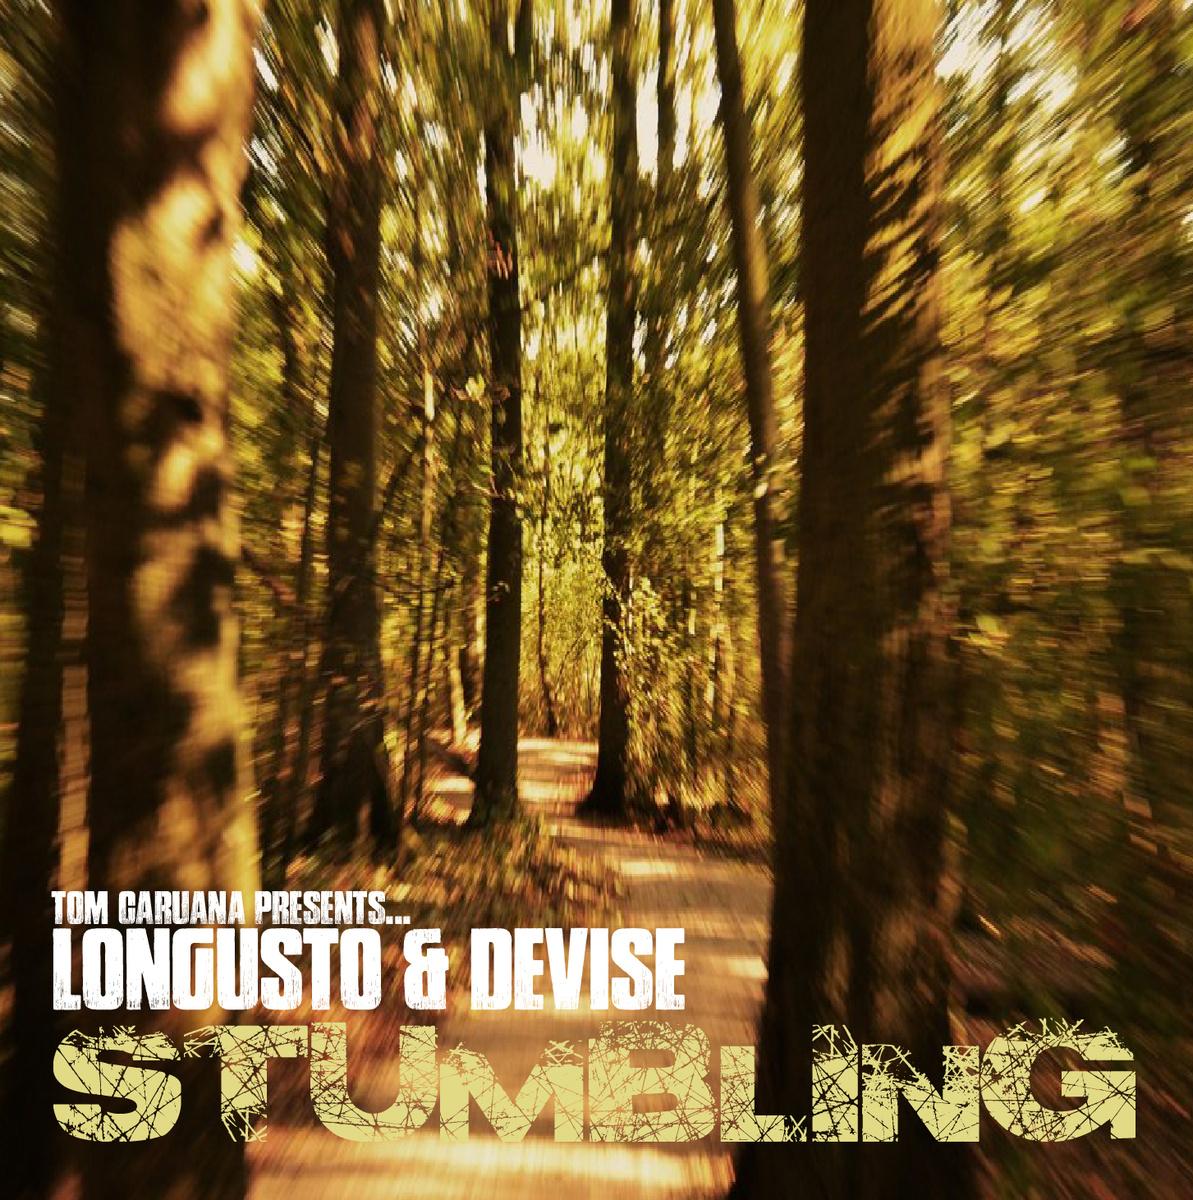 Tom Caruana Presents... Longusto & Devise - Stumbling